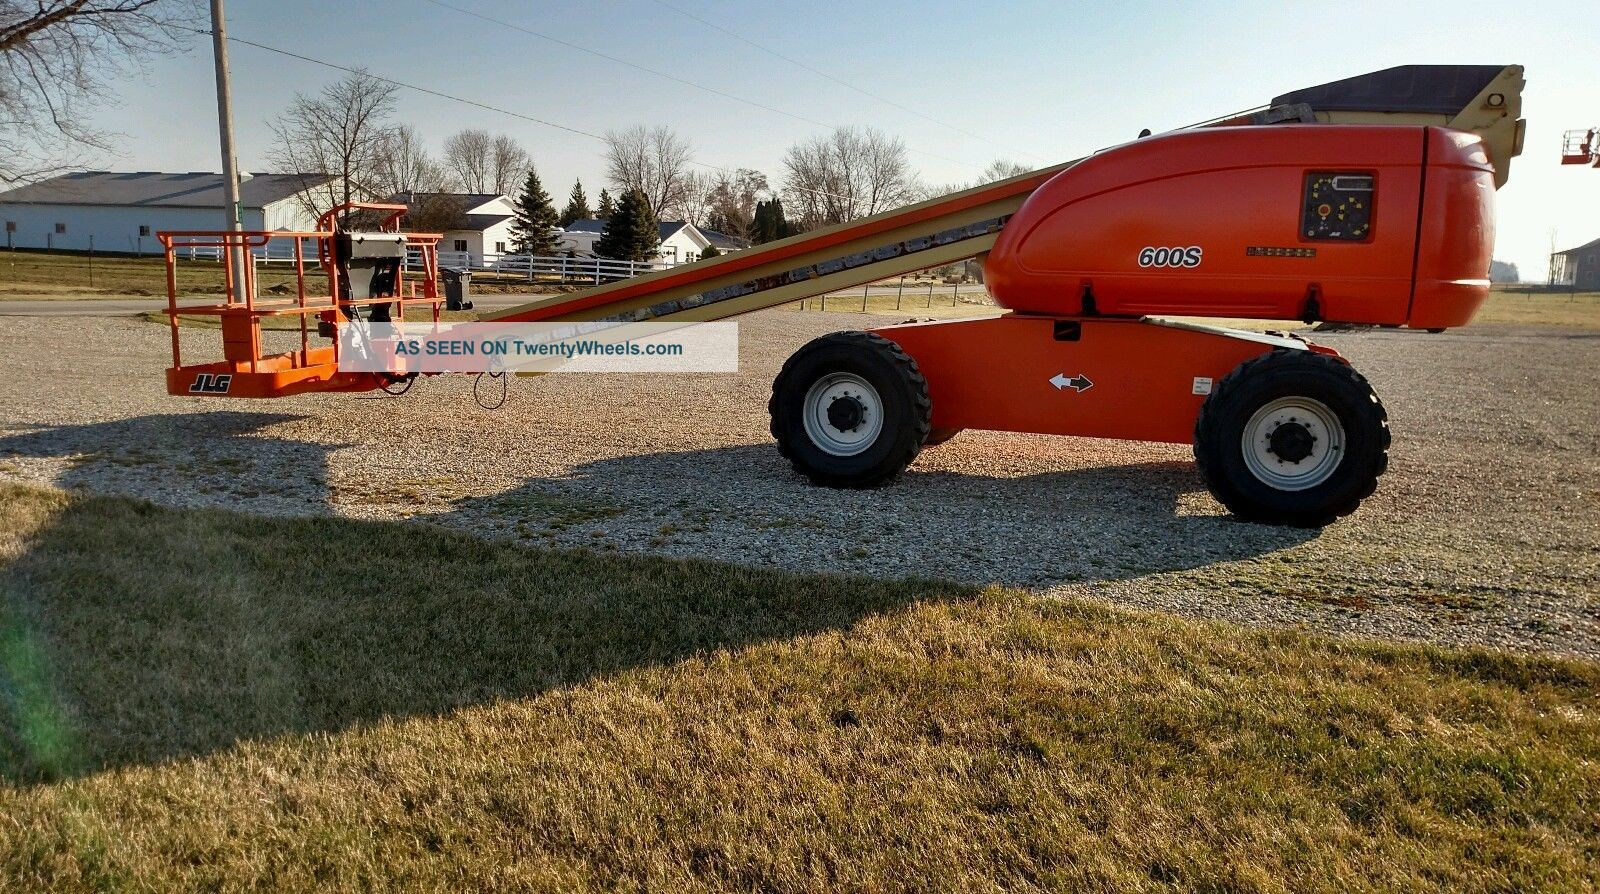 2006 Jlg 600s Boom Man Lift 60 ' Rough Terrain Aerial Diesel 4x4 Scissor & Boom Lifts photo